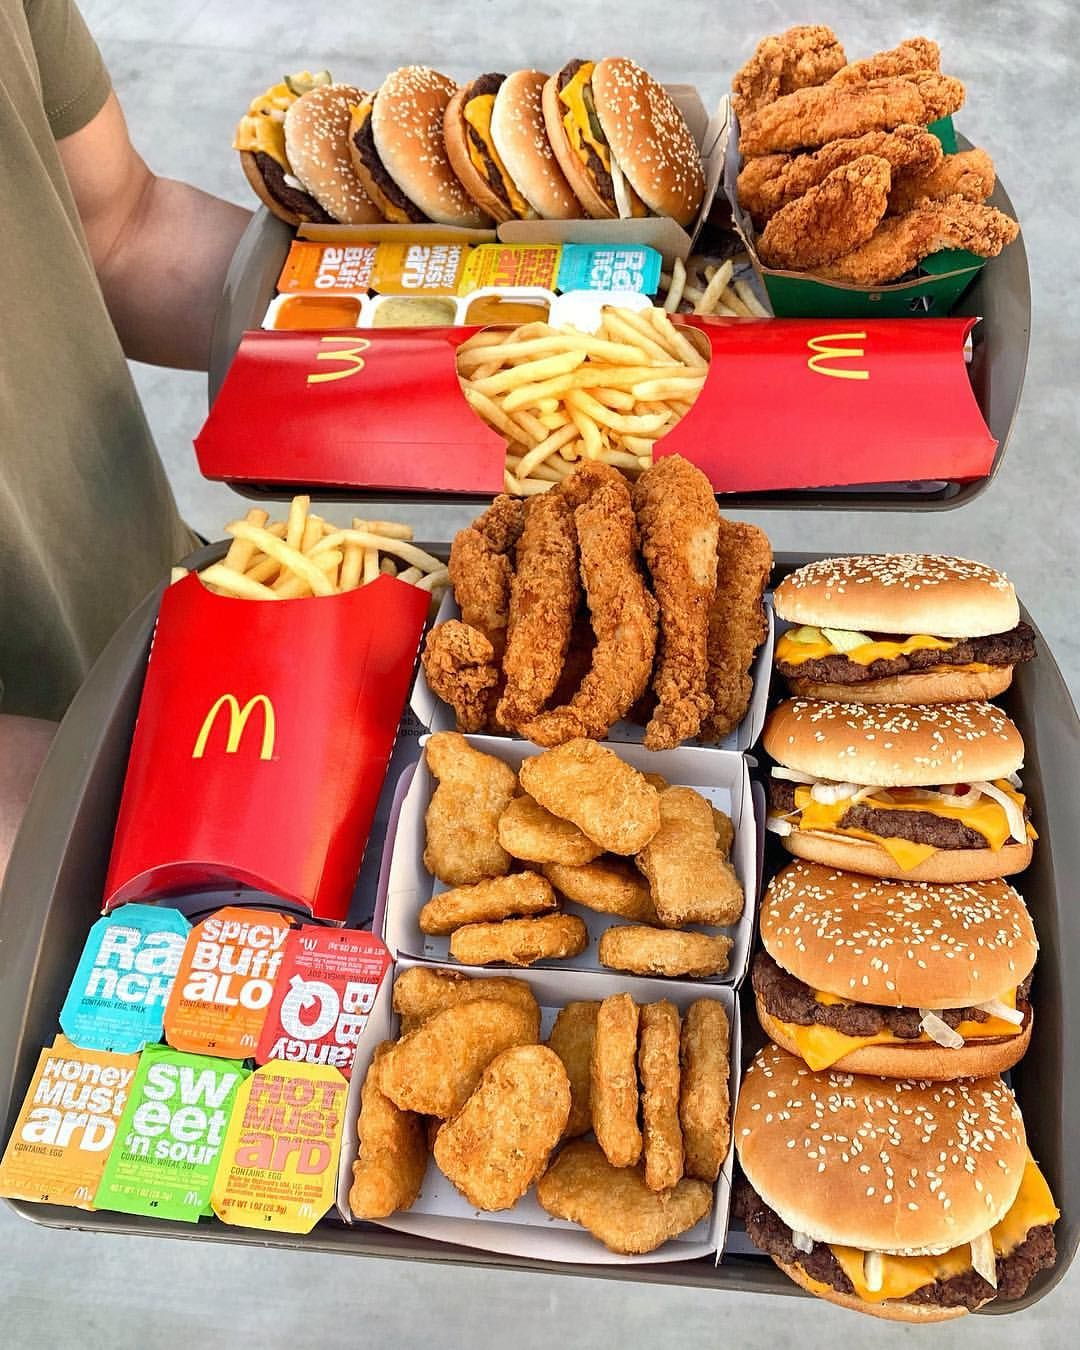 mcdonalds | Food cravings, Amazing food, Aesthetic food